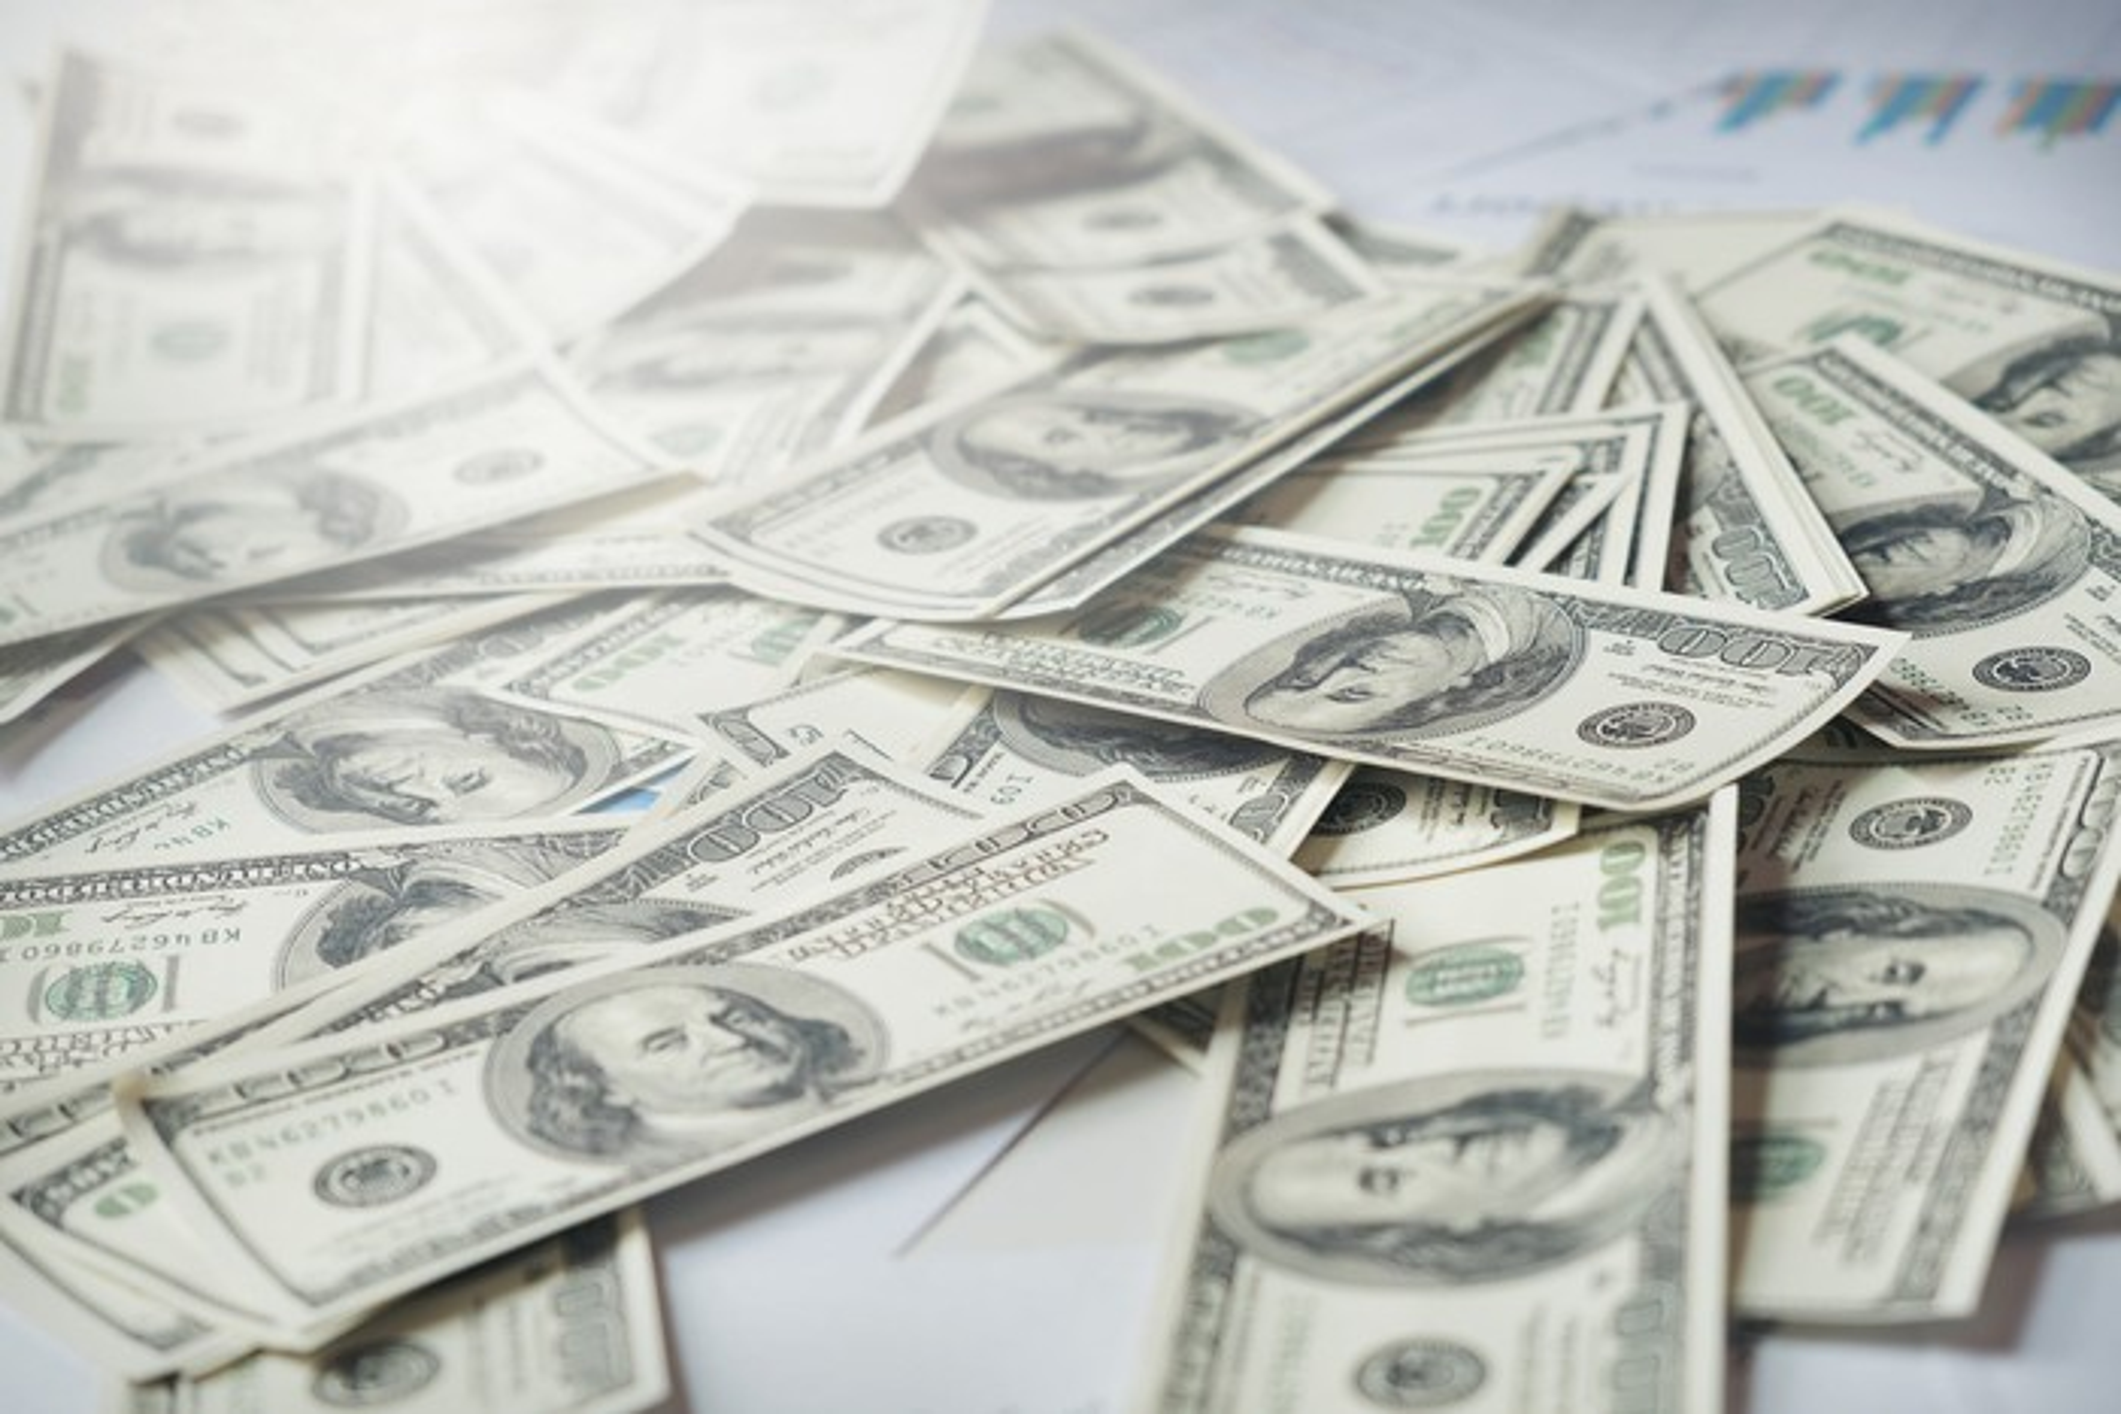 $100 billion on a flat surface.